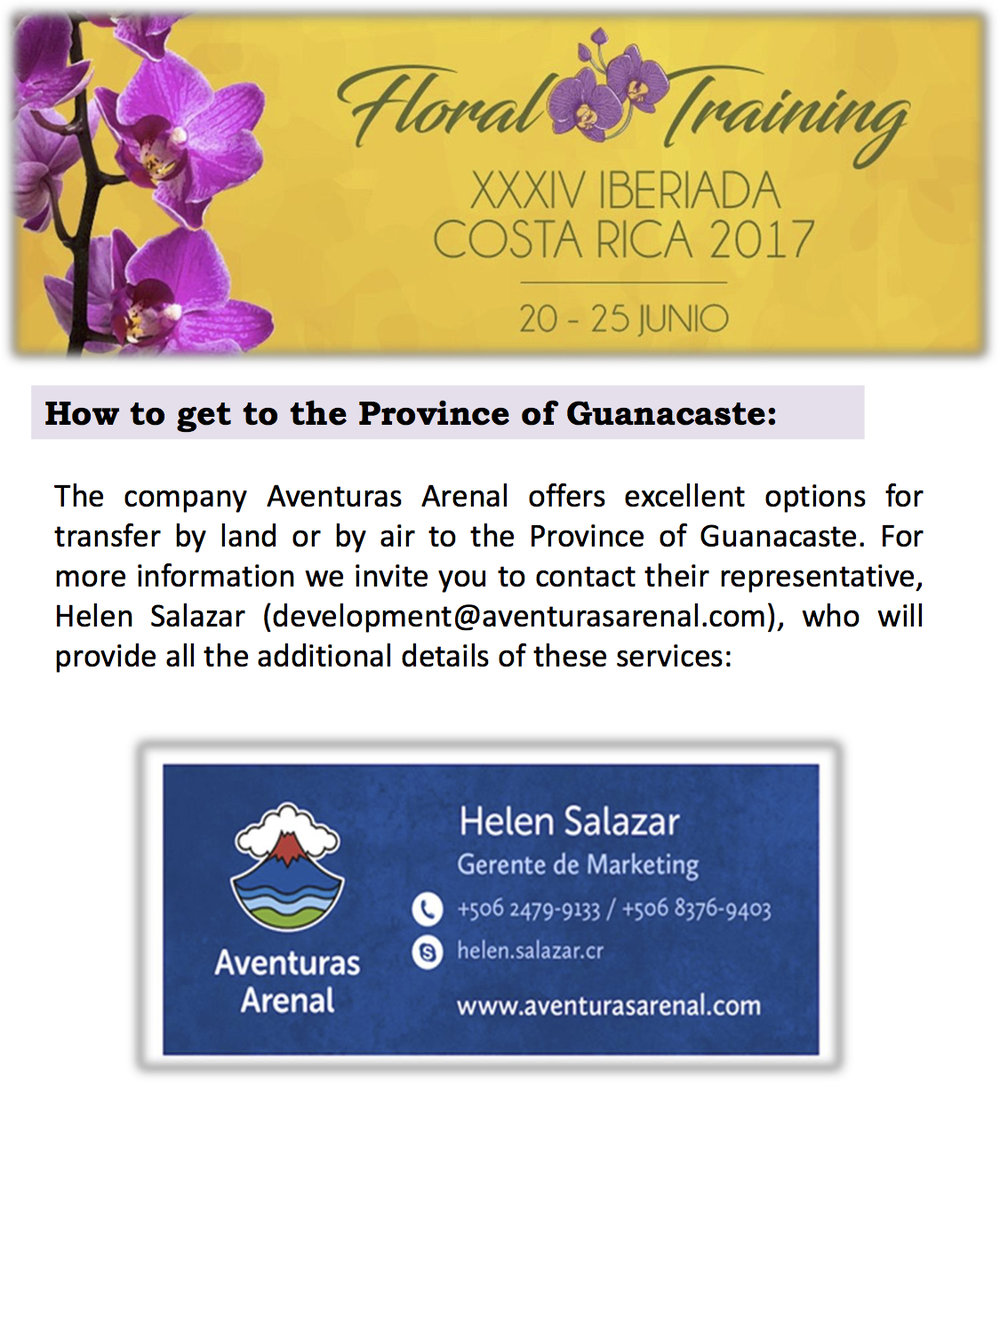 Floral Training - XXXIV Iberiada Costa Rica 2017 (English) 4.jpg